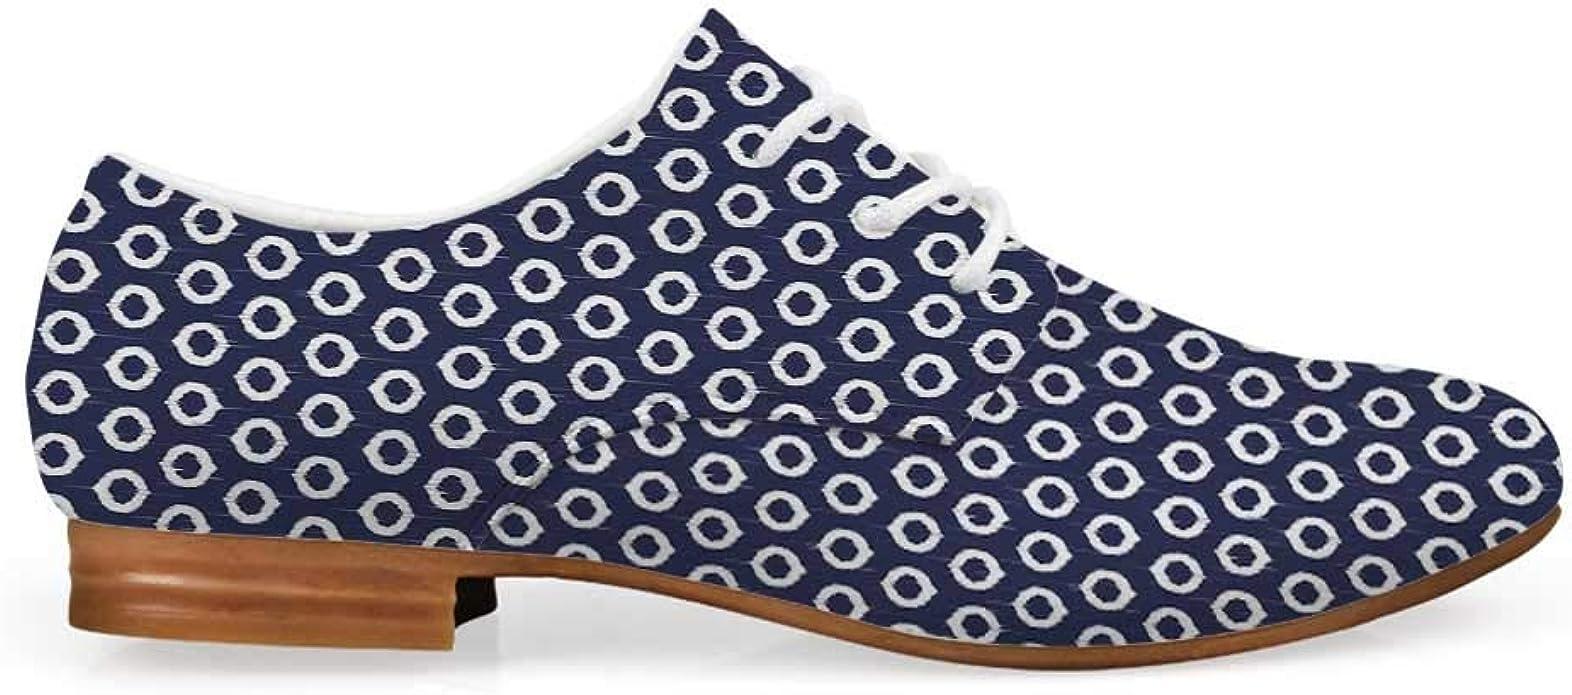 Amazon Com C Coaballa Ikat Comfortable Leather Shoes For Women